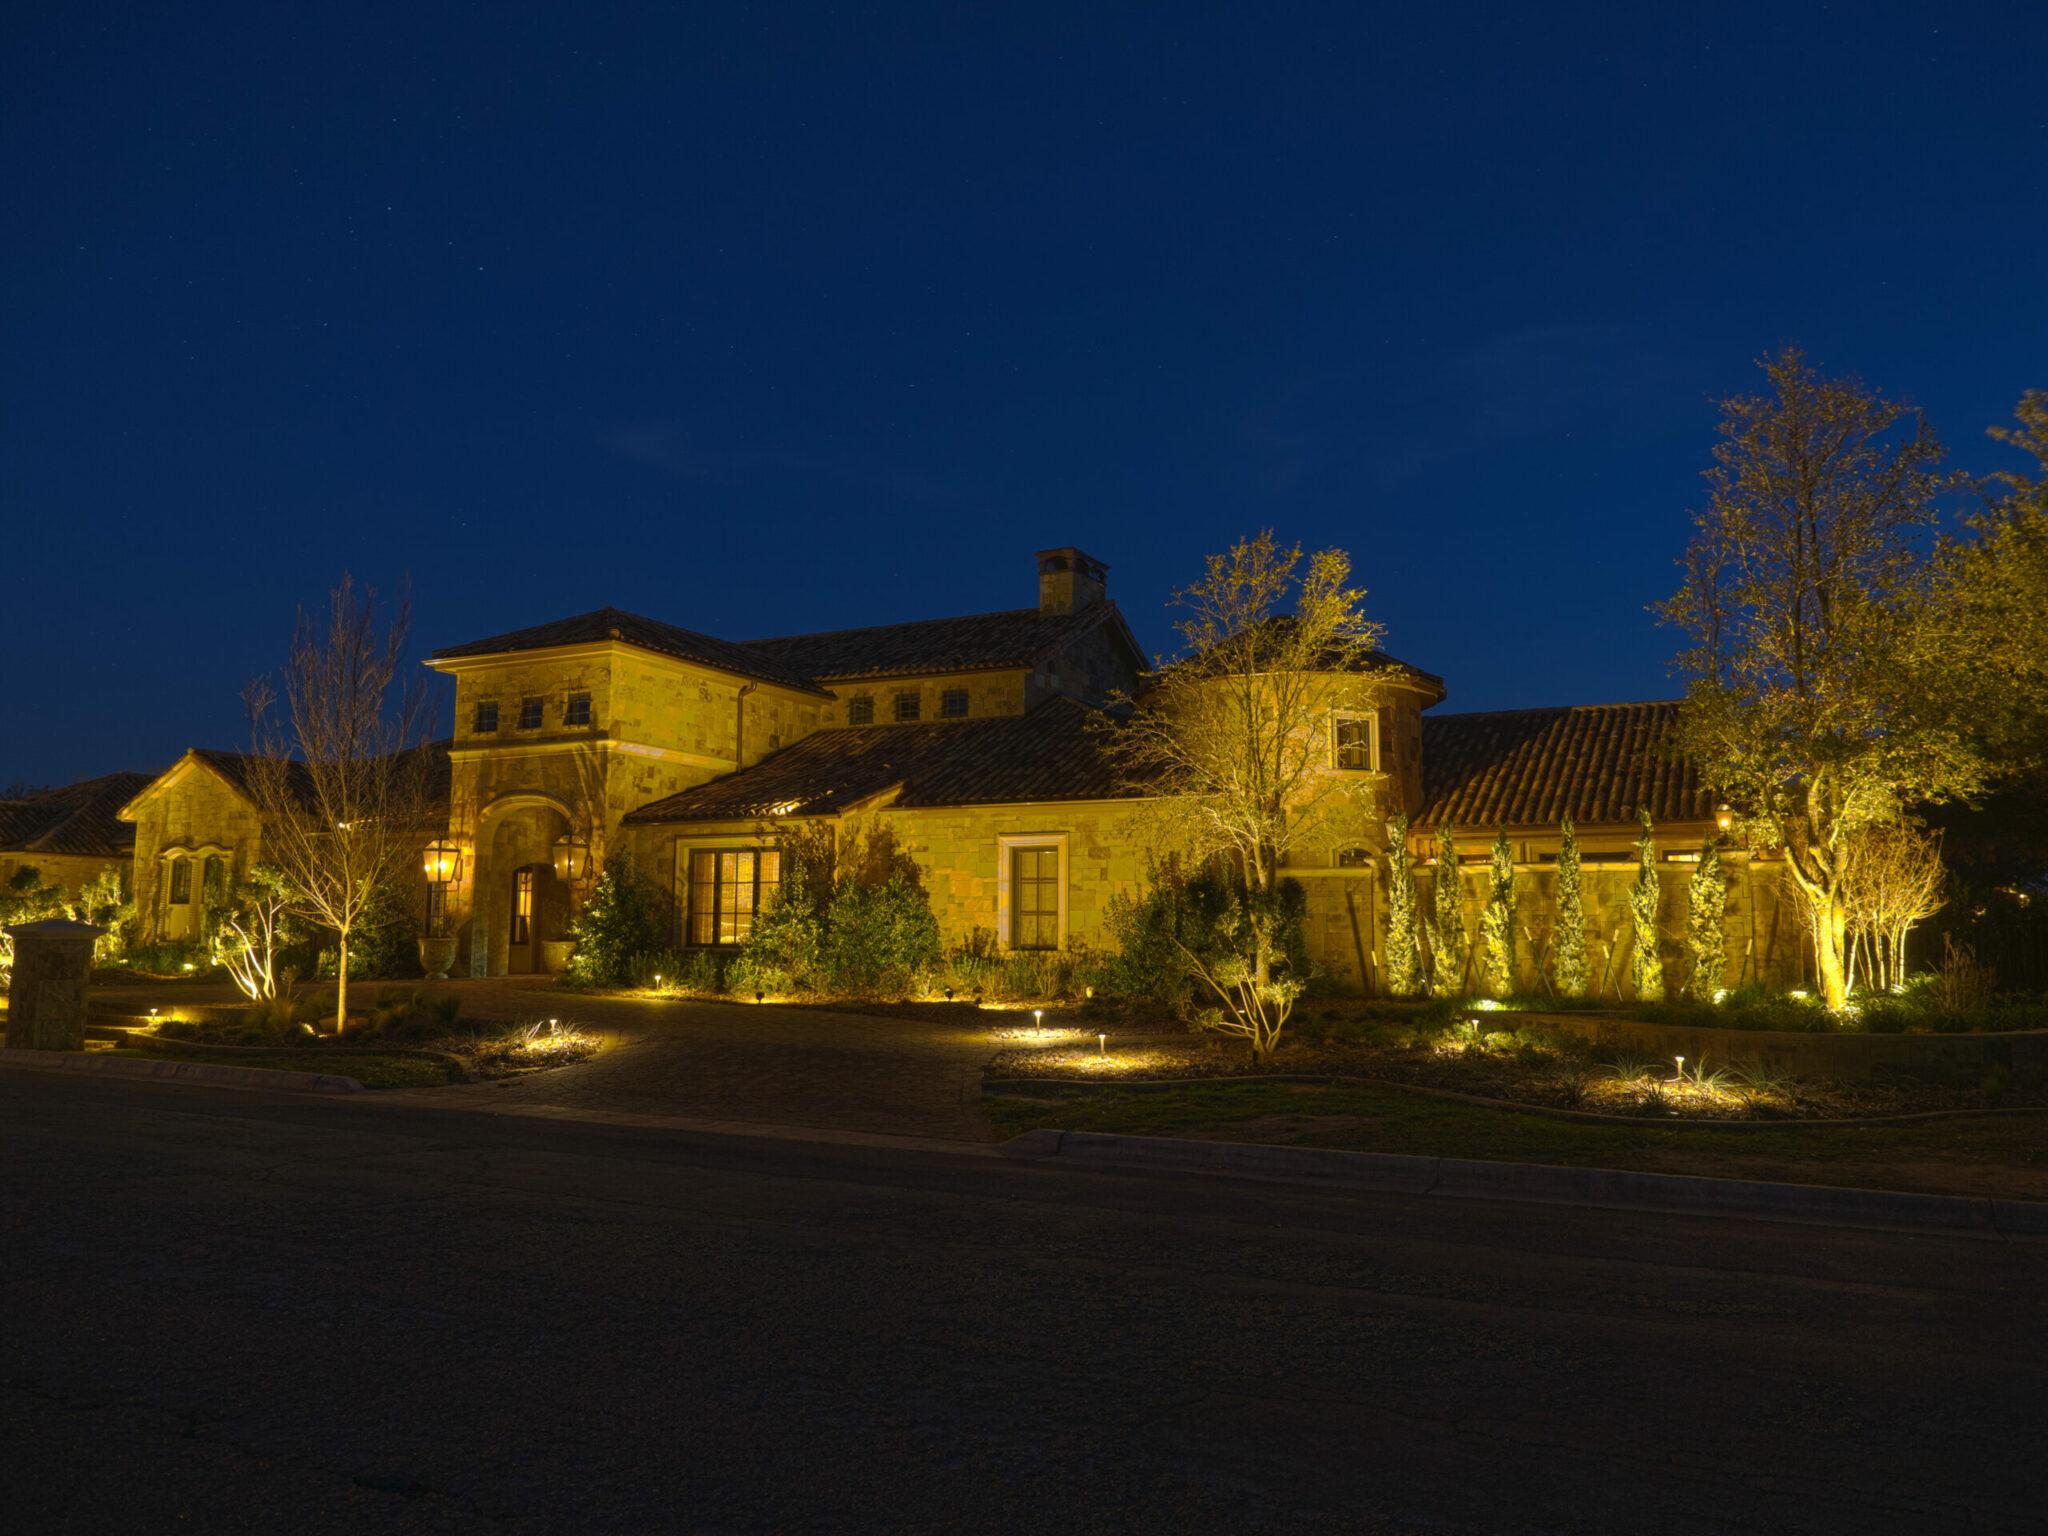 Lone Star Lighting, 45 Muirfield, Abilene Texas